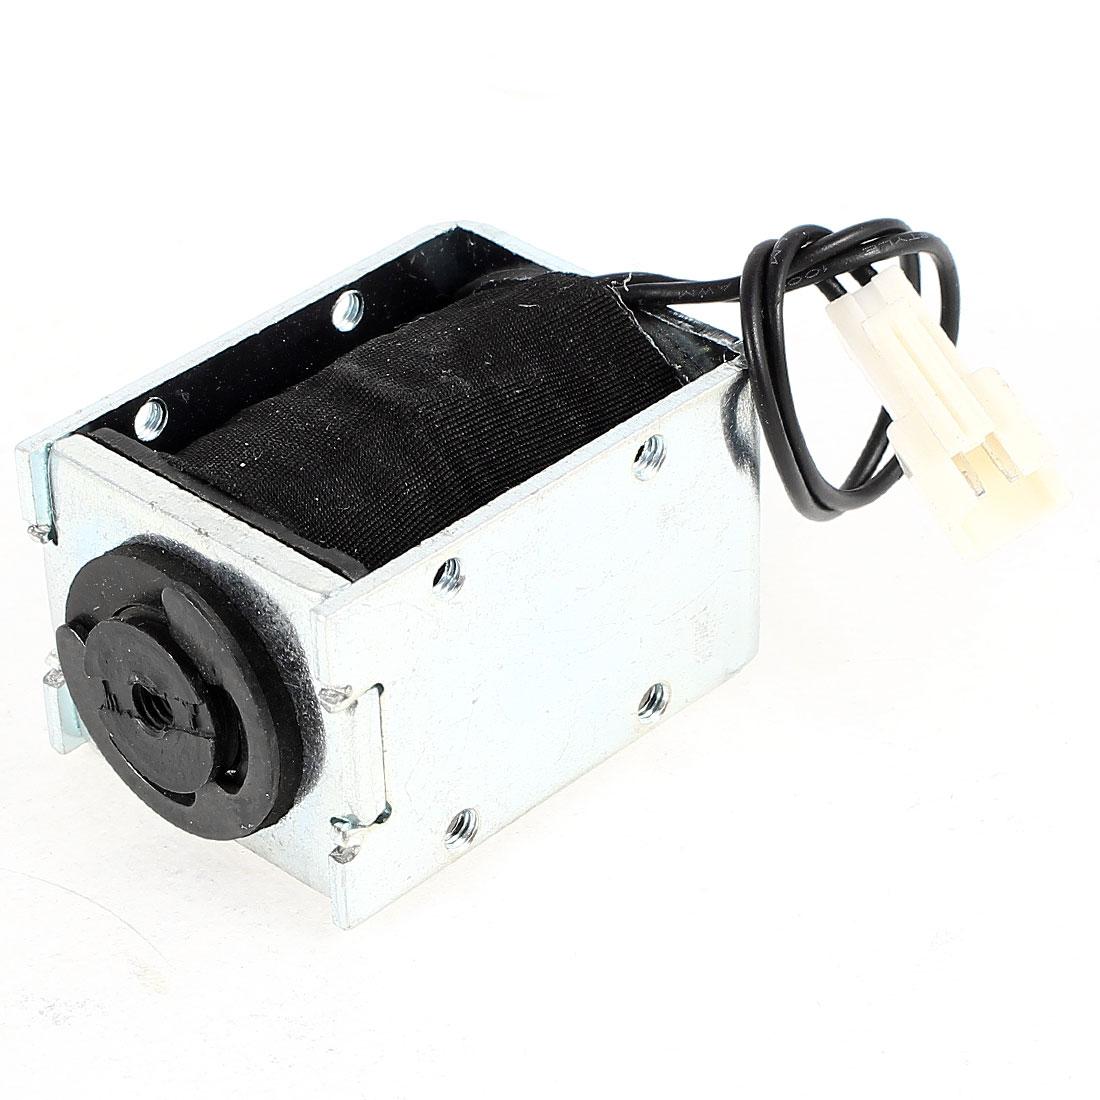 DC 24V 0.17A 5mm Stroke 2.5LB 1.1Kg Pull Type Open Frame Eletric Actuator Solenoid Electromagnet